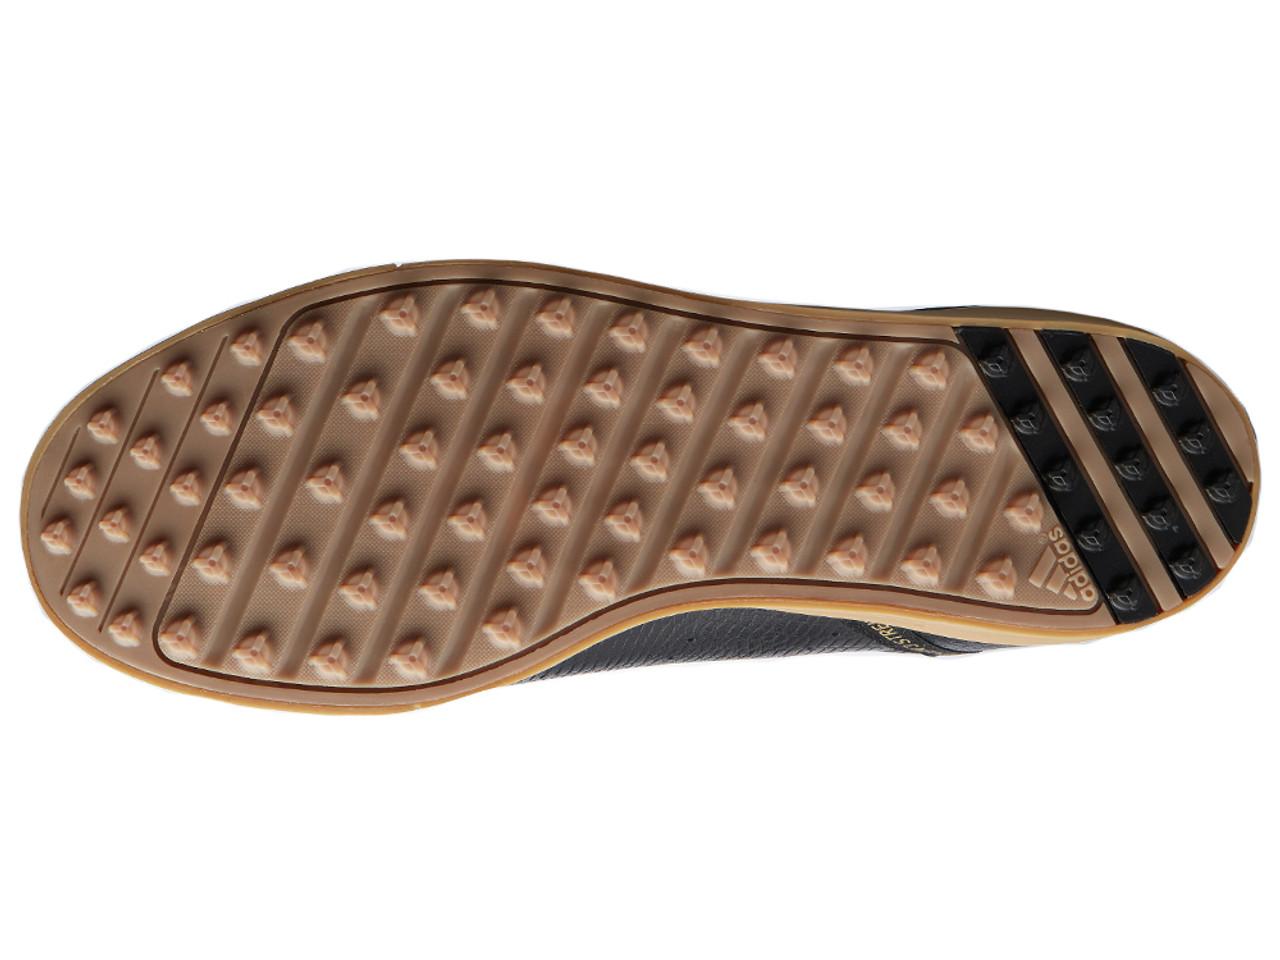 huge discount 8dff2 6e8e6 Adidas Adicross Classic Golf Shoes - Core BlackFTWR White